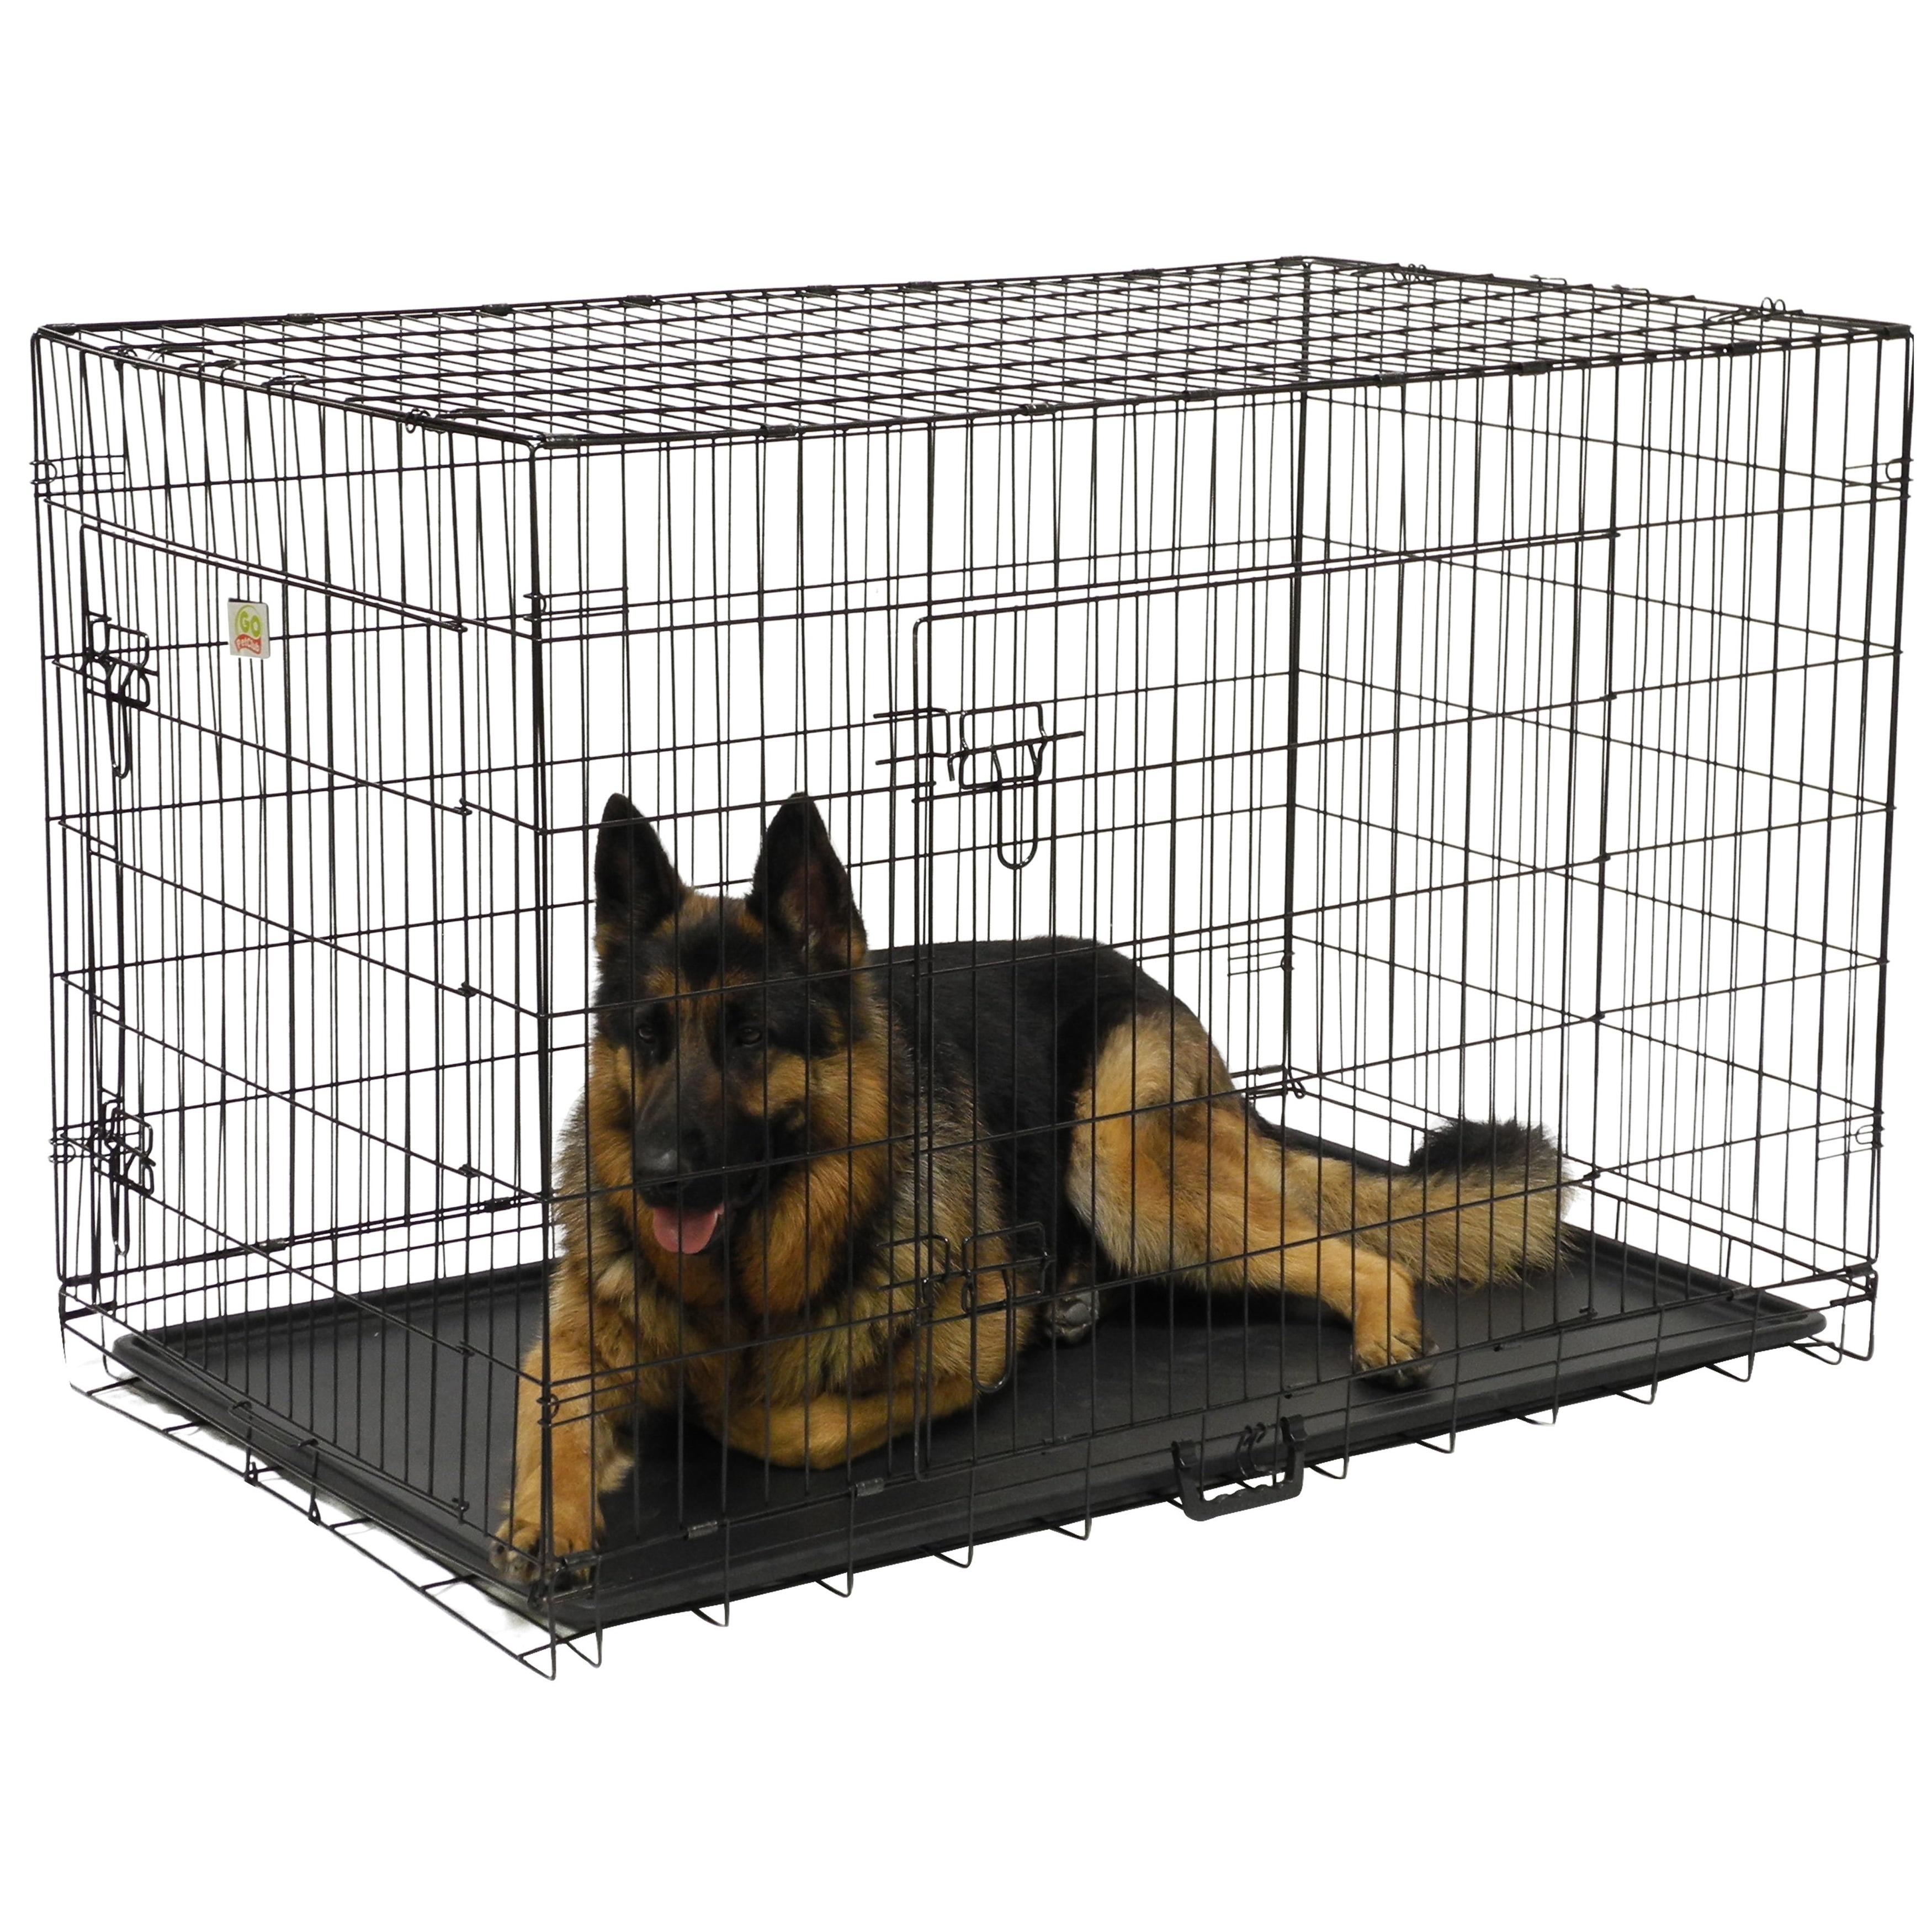 Gopetclub 48 Inch 2 Door Folding Metal Dog Crate W Divider Free